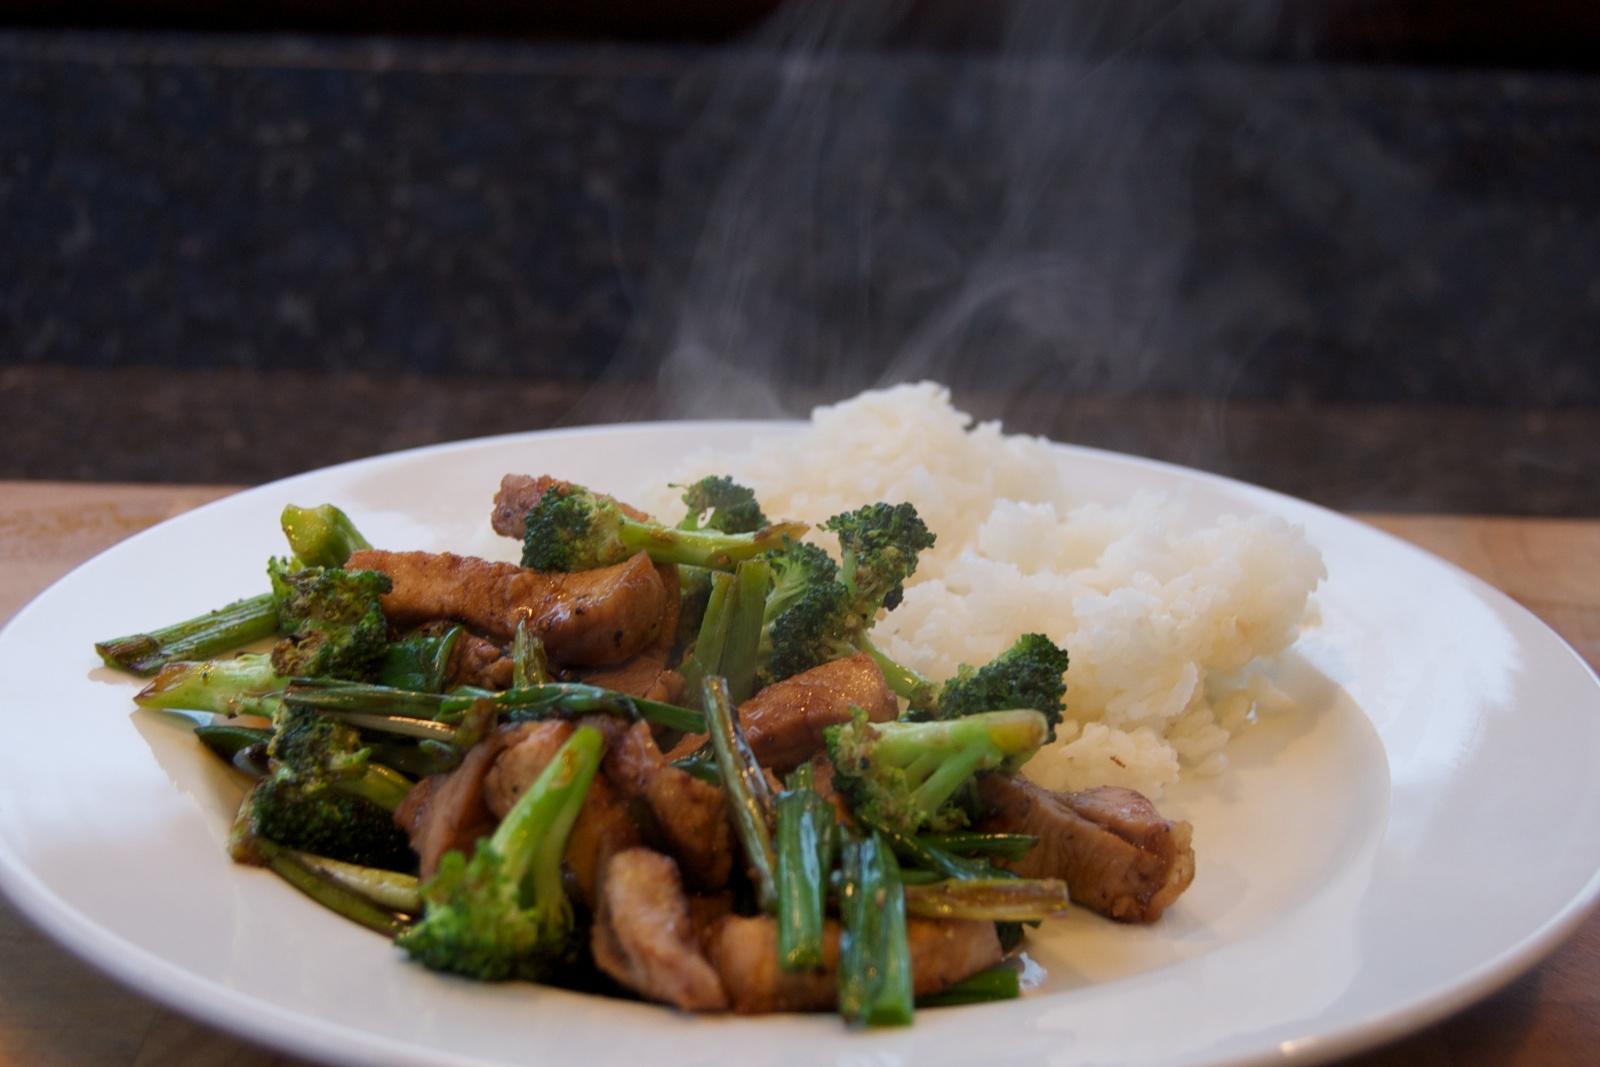 http://blog.rickk.com/food/2013/12/17/ate.2013.12.17.l.jpg